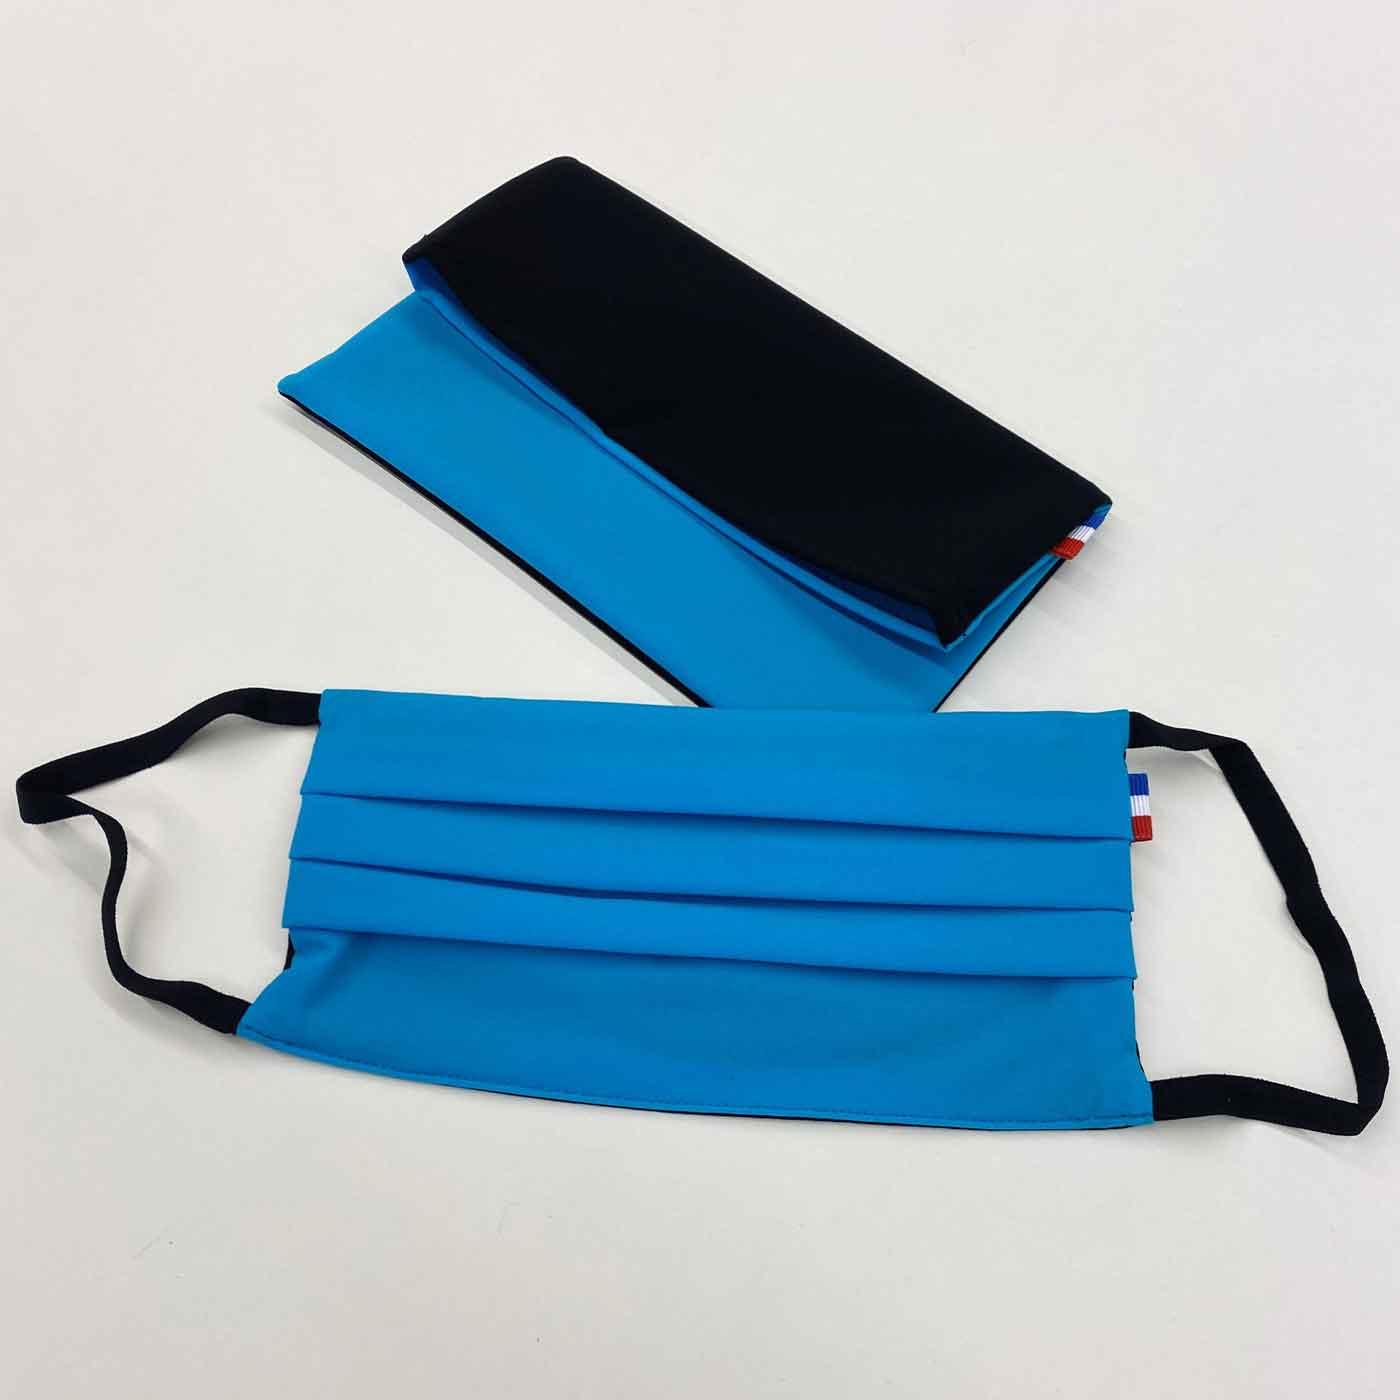 pochette-masque-de-protection-respiratoire-tissu-couleur-bleu